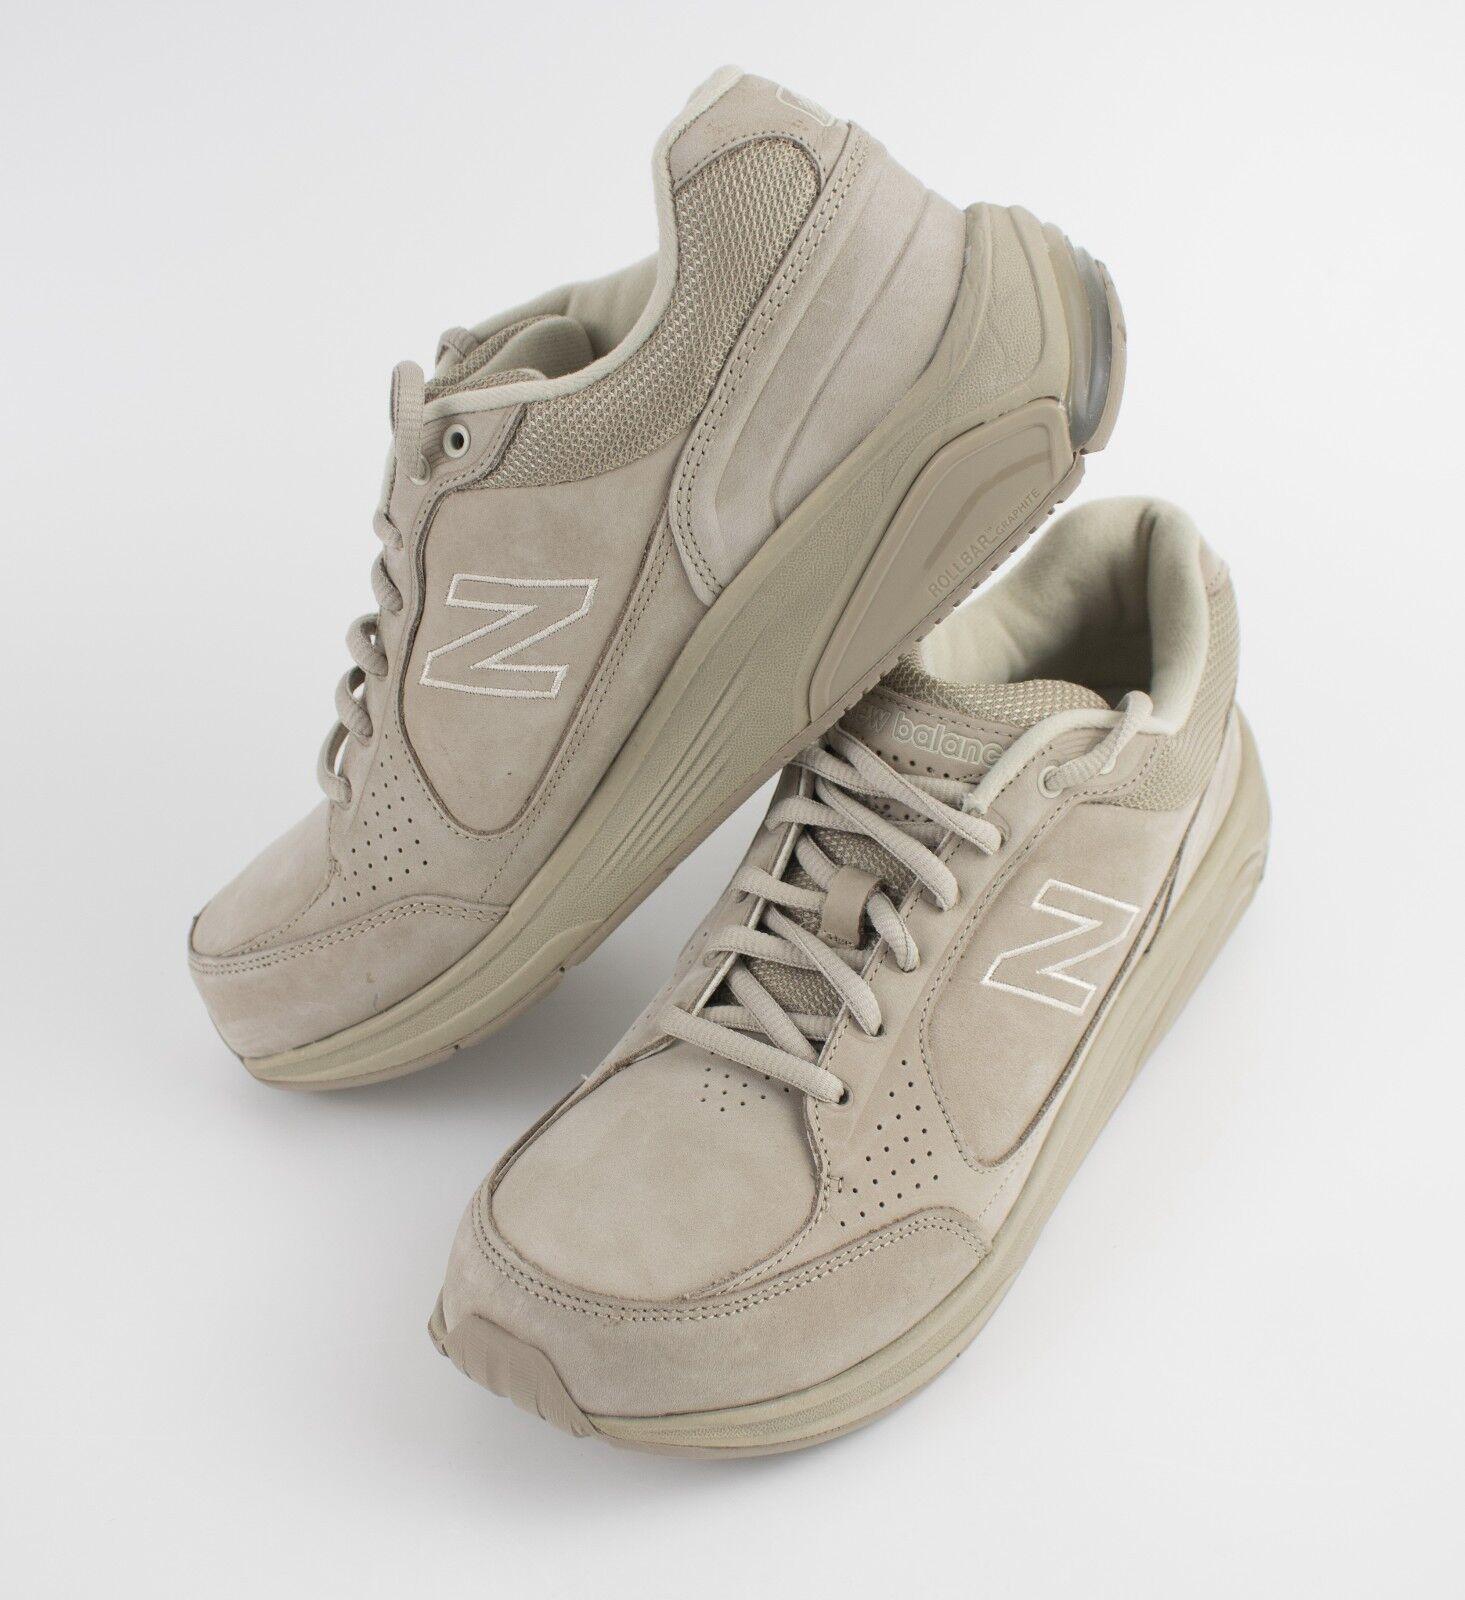 NEW BALANCE donna WW928TN WALKING scarpe da ginnastica Sz 10 1 2  GB3